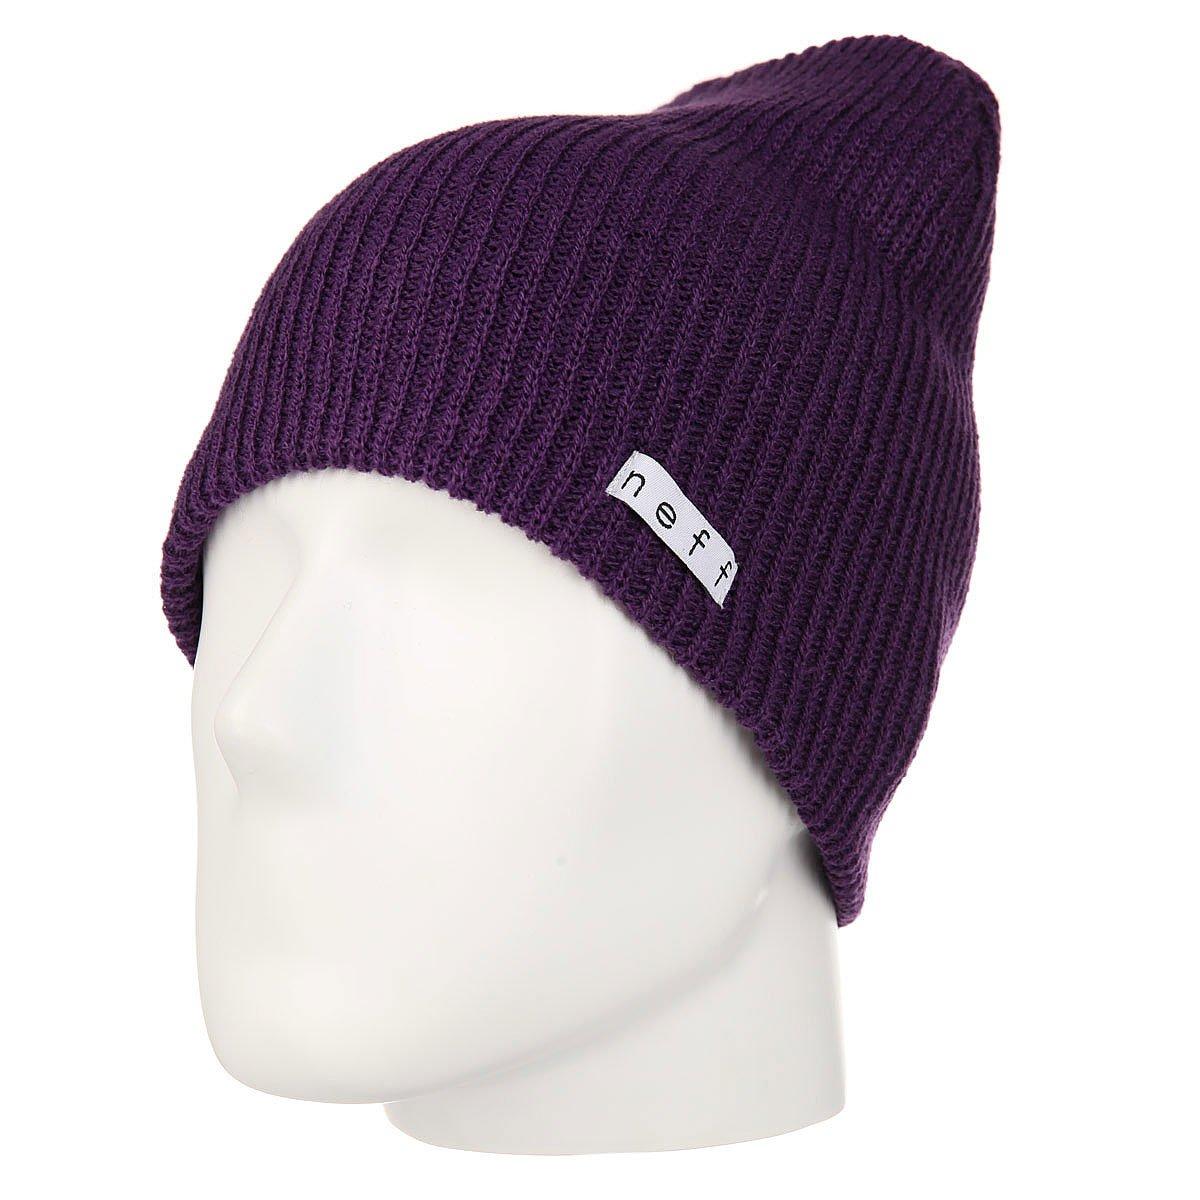 1161bd9c8f2 Купить шапку Neff Daily Beanie Purple в интернет-магазине Proskater.kz